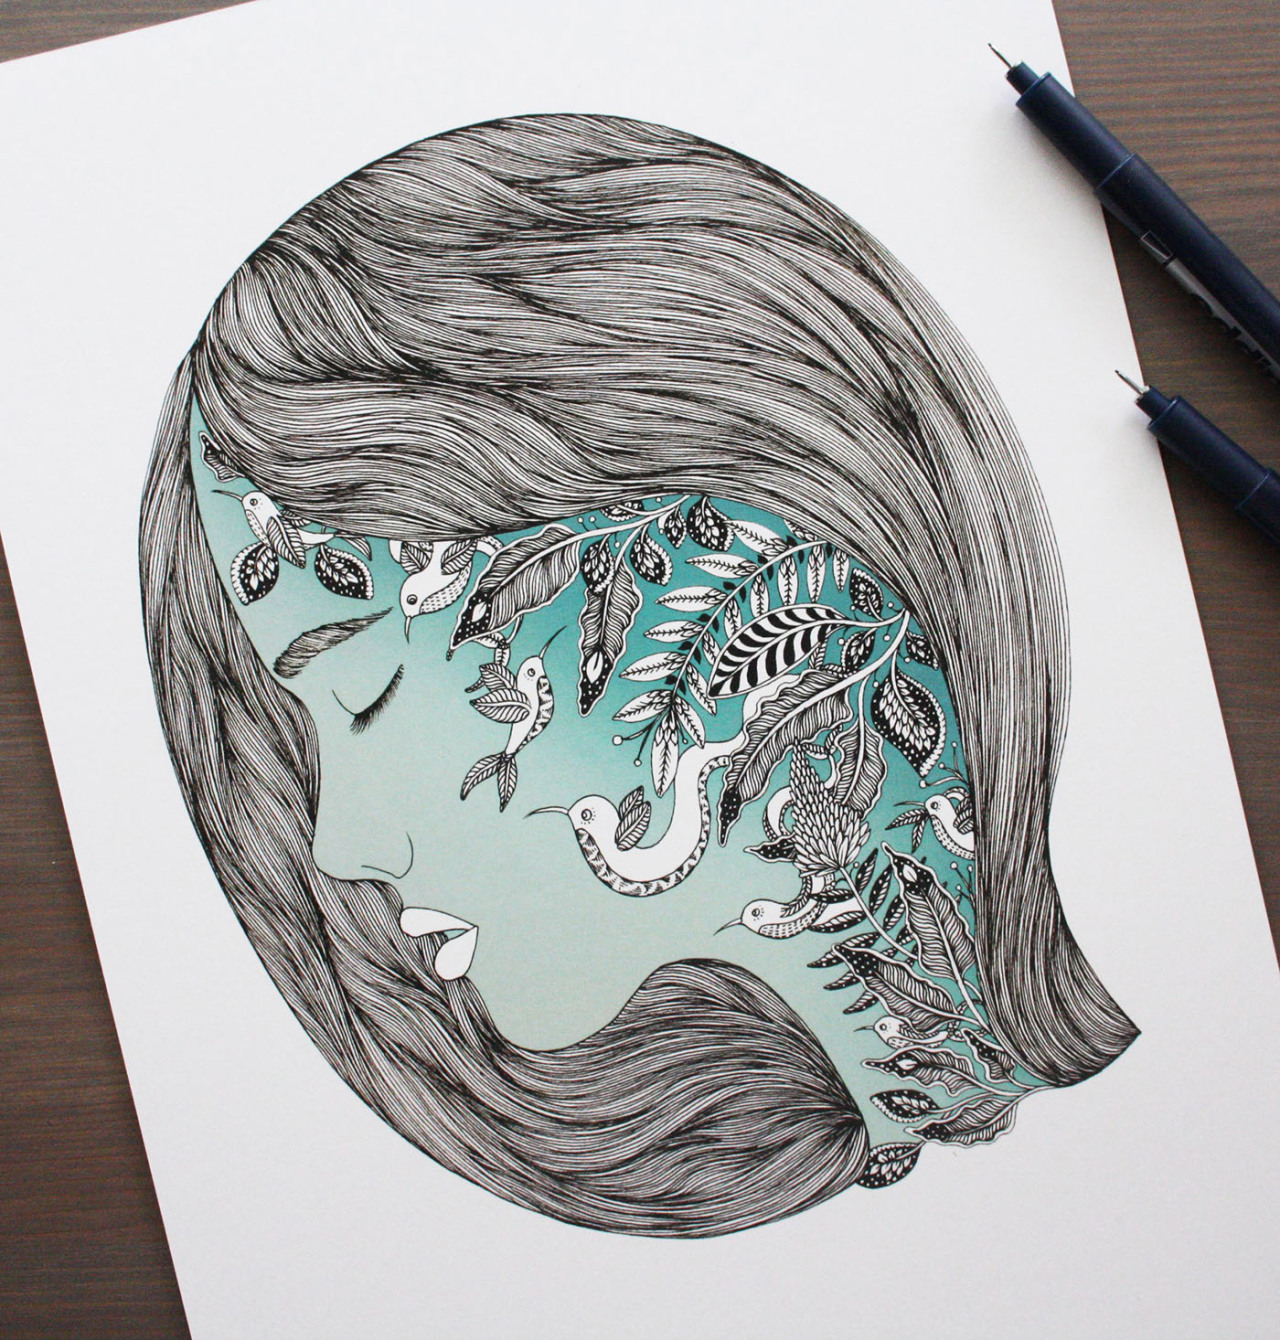 CNL — Ornate Ink Illustrations Of